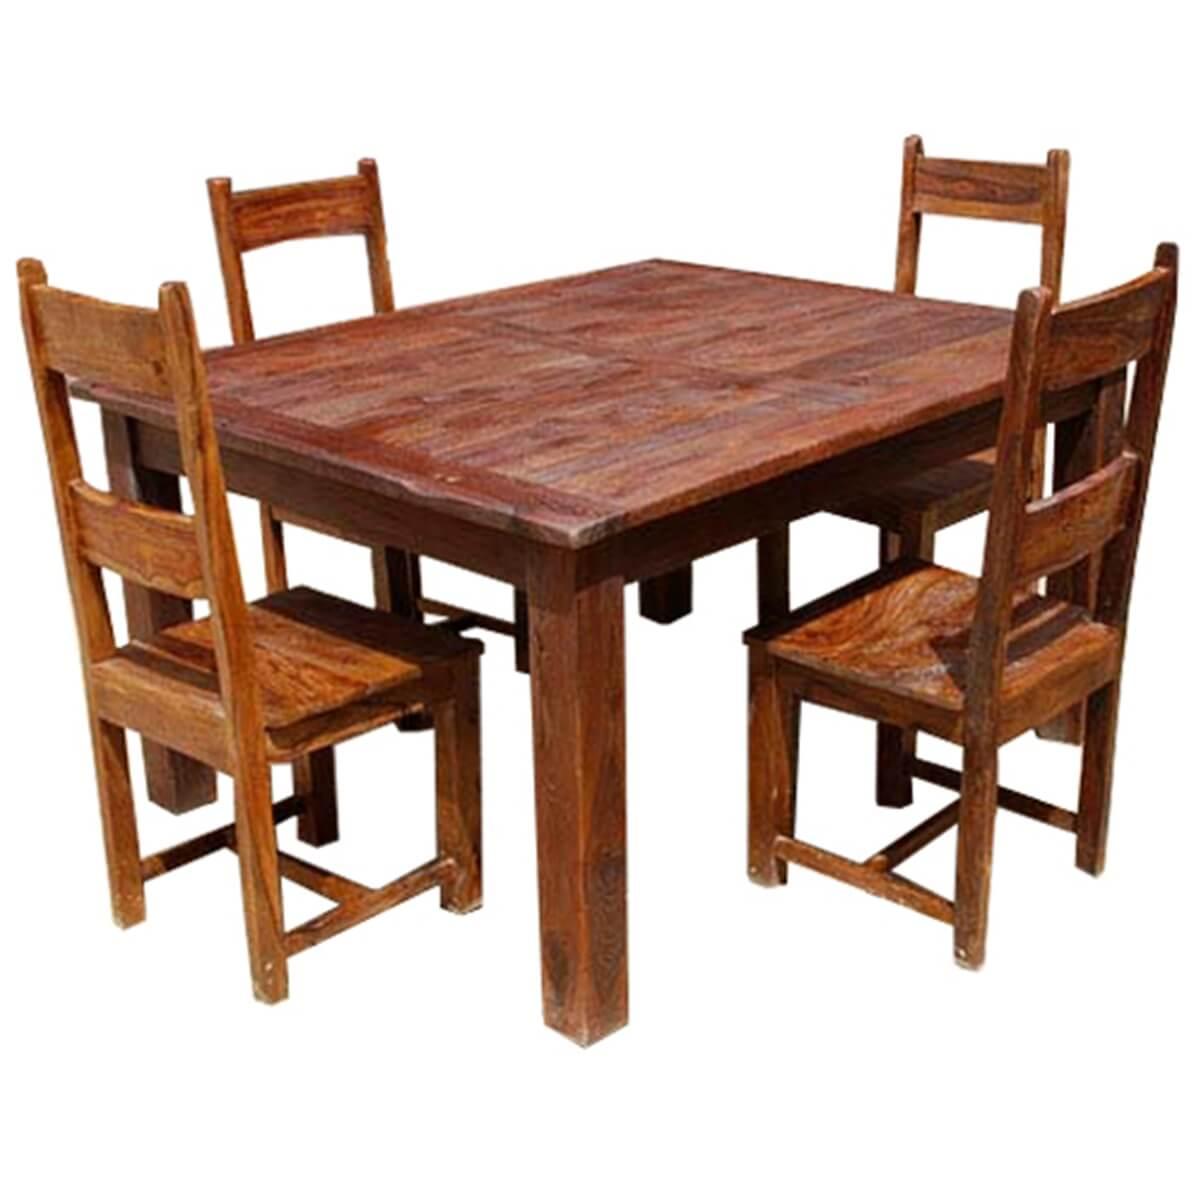 Appalachian Rustic 5pc Solid Wood Kitchen Dinette Set